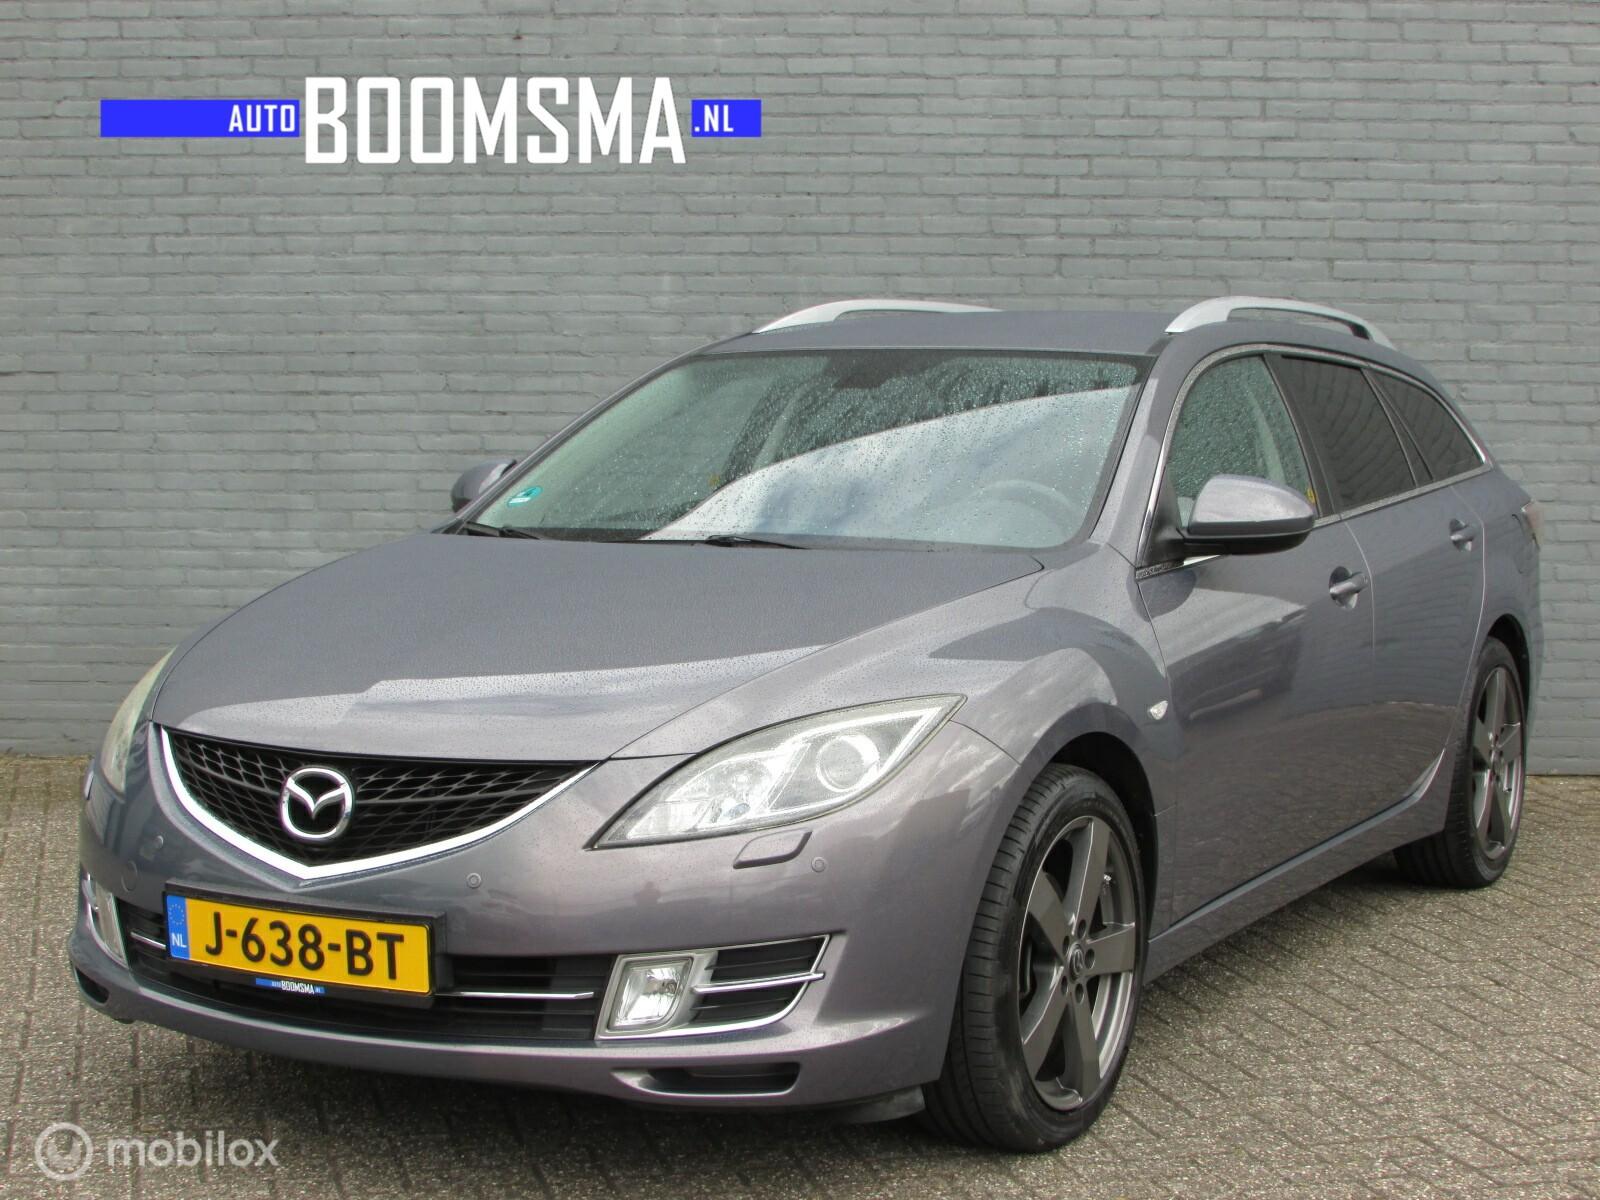 Mazda 6 Sportbreak 2.5 170pk Exclusive Full options